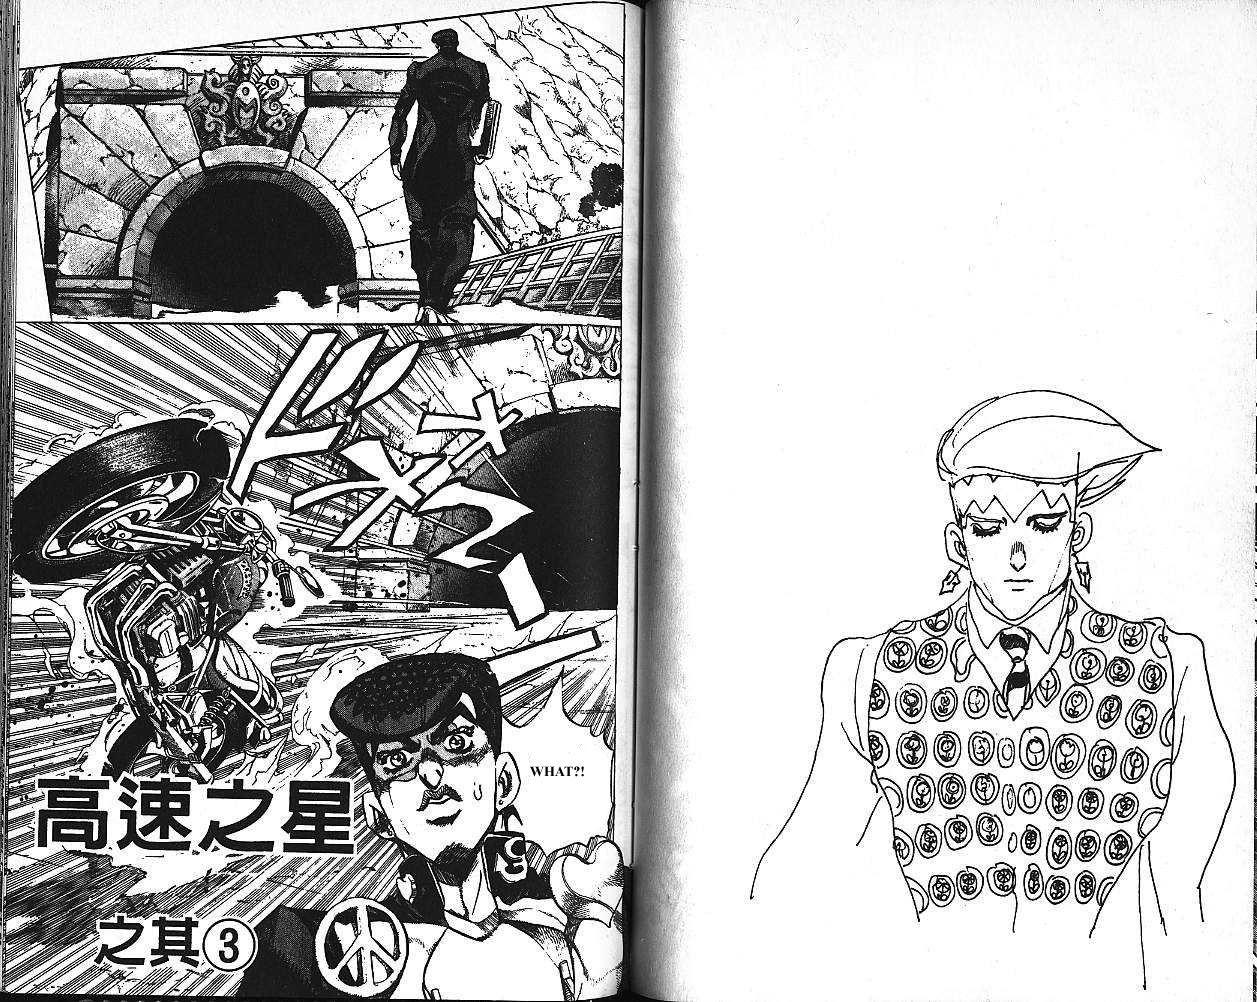 JoJo's Bizarre Adventure 386 Page 1